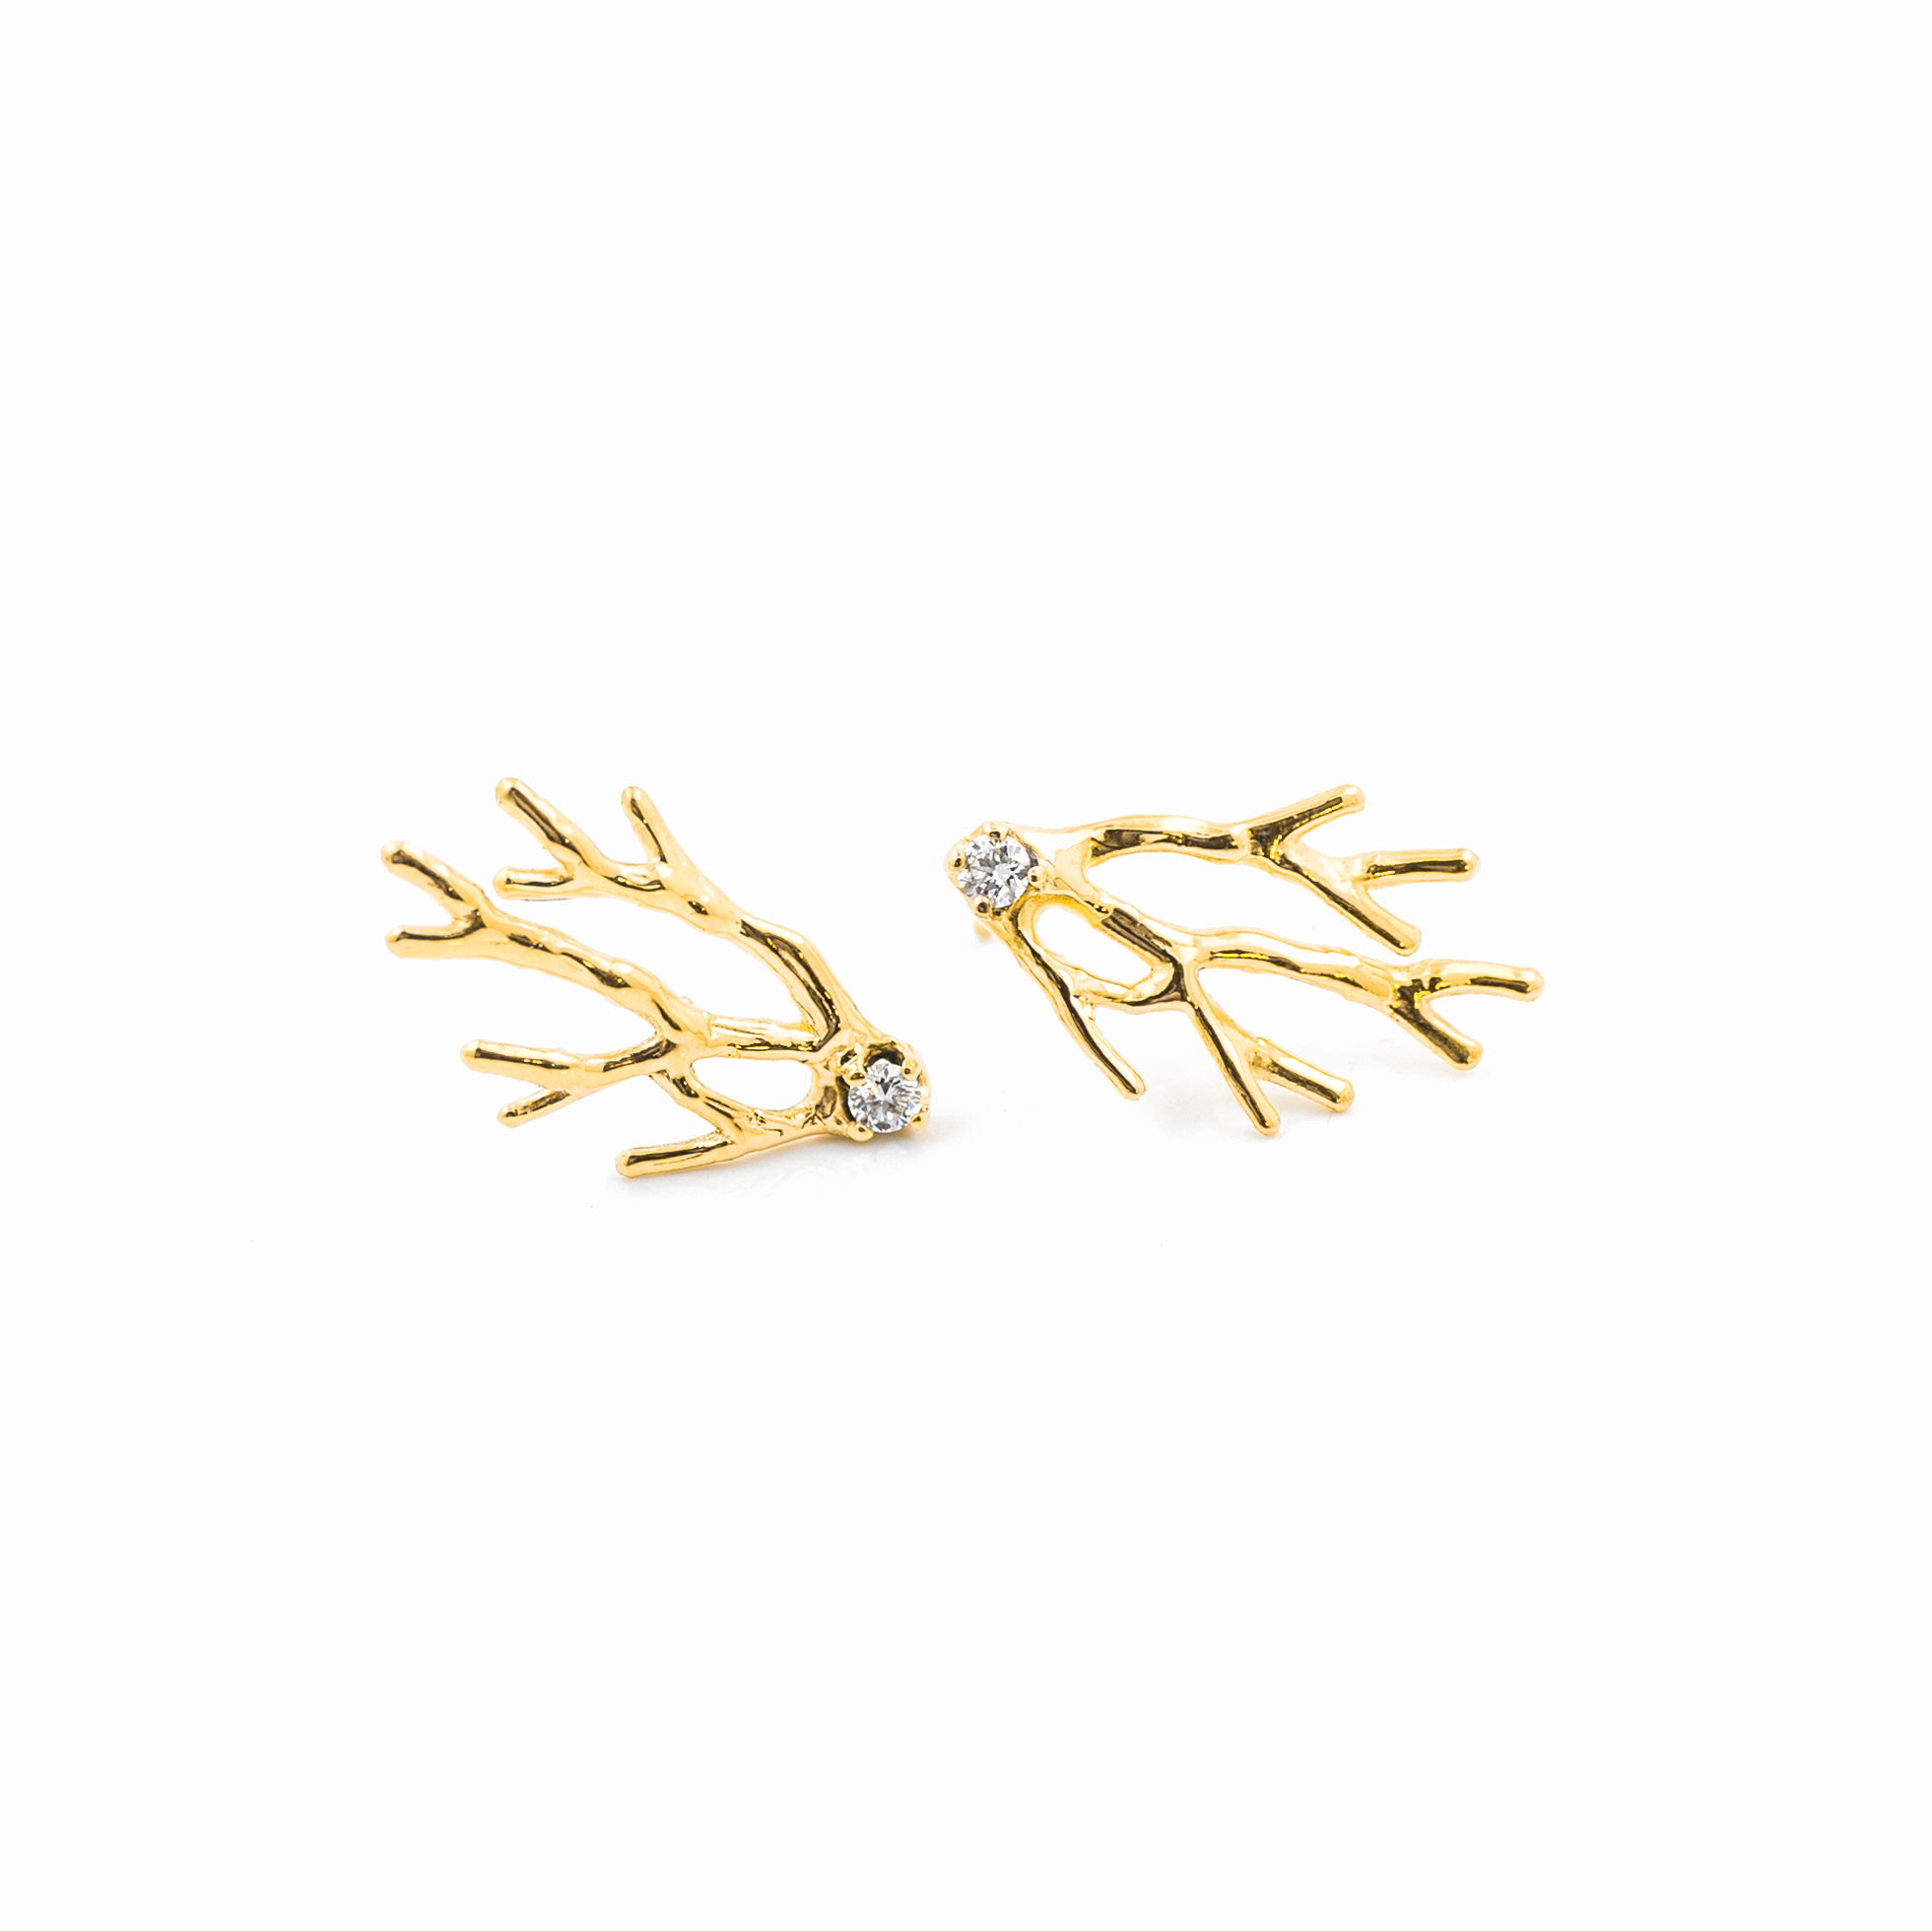 Dendrite Earrings | 18ct yellow gold, white diamonds.